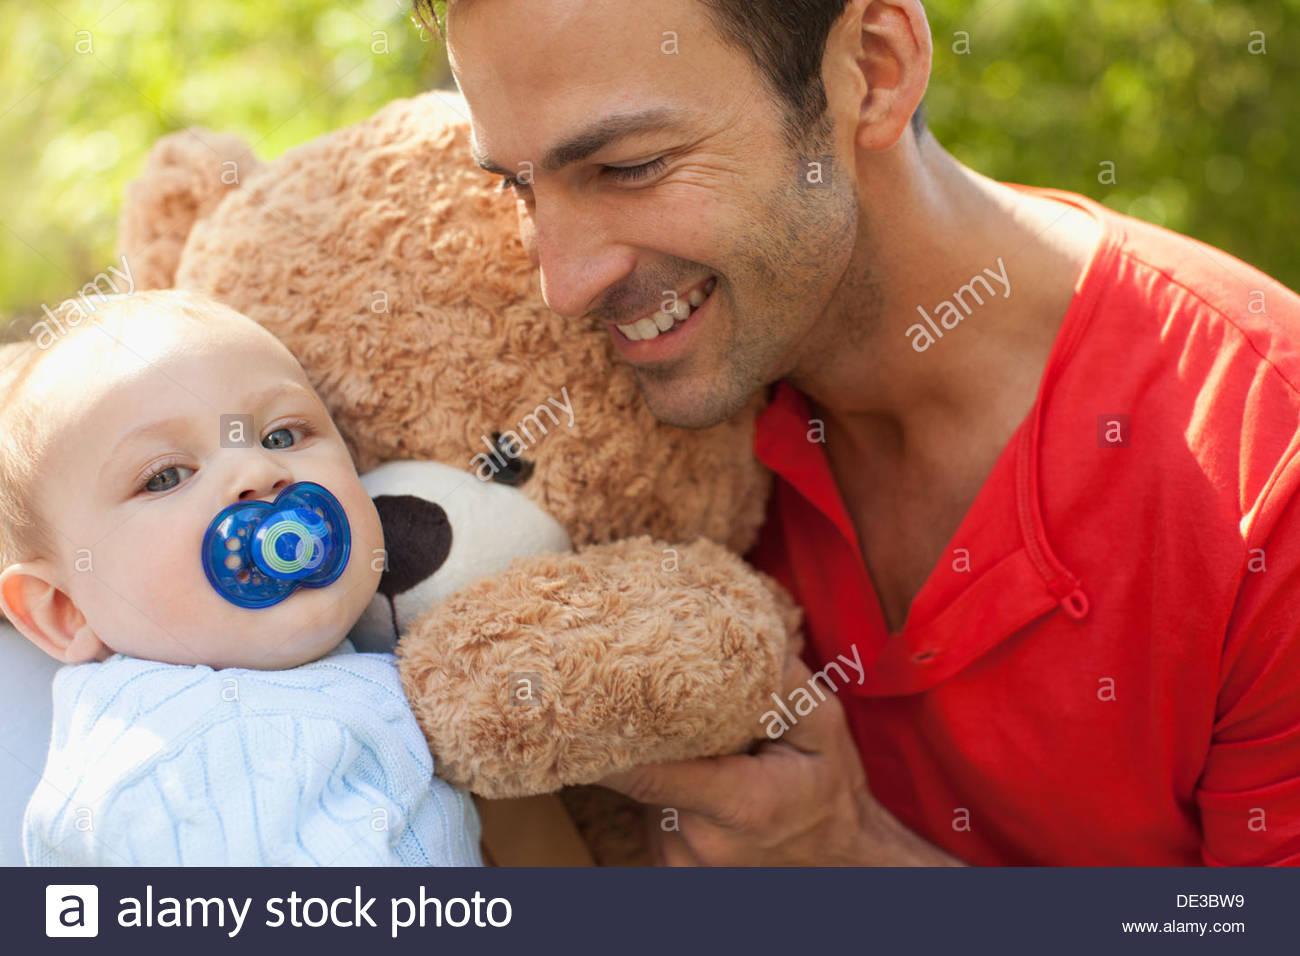 Vater und Kind mit Teddy Bär Stockbild